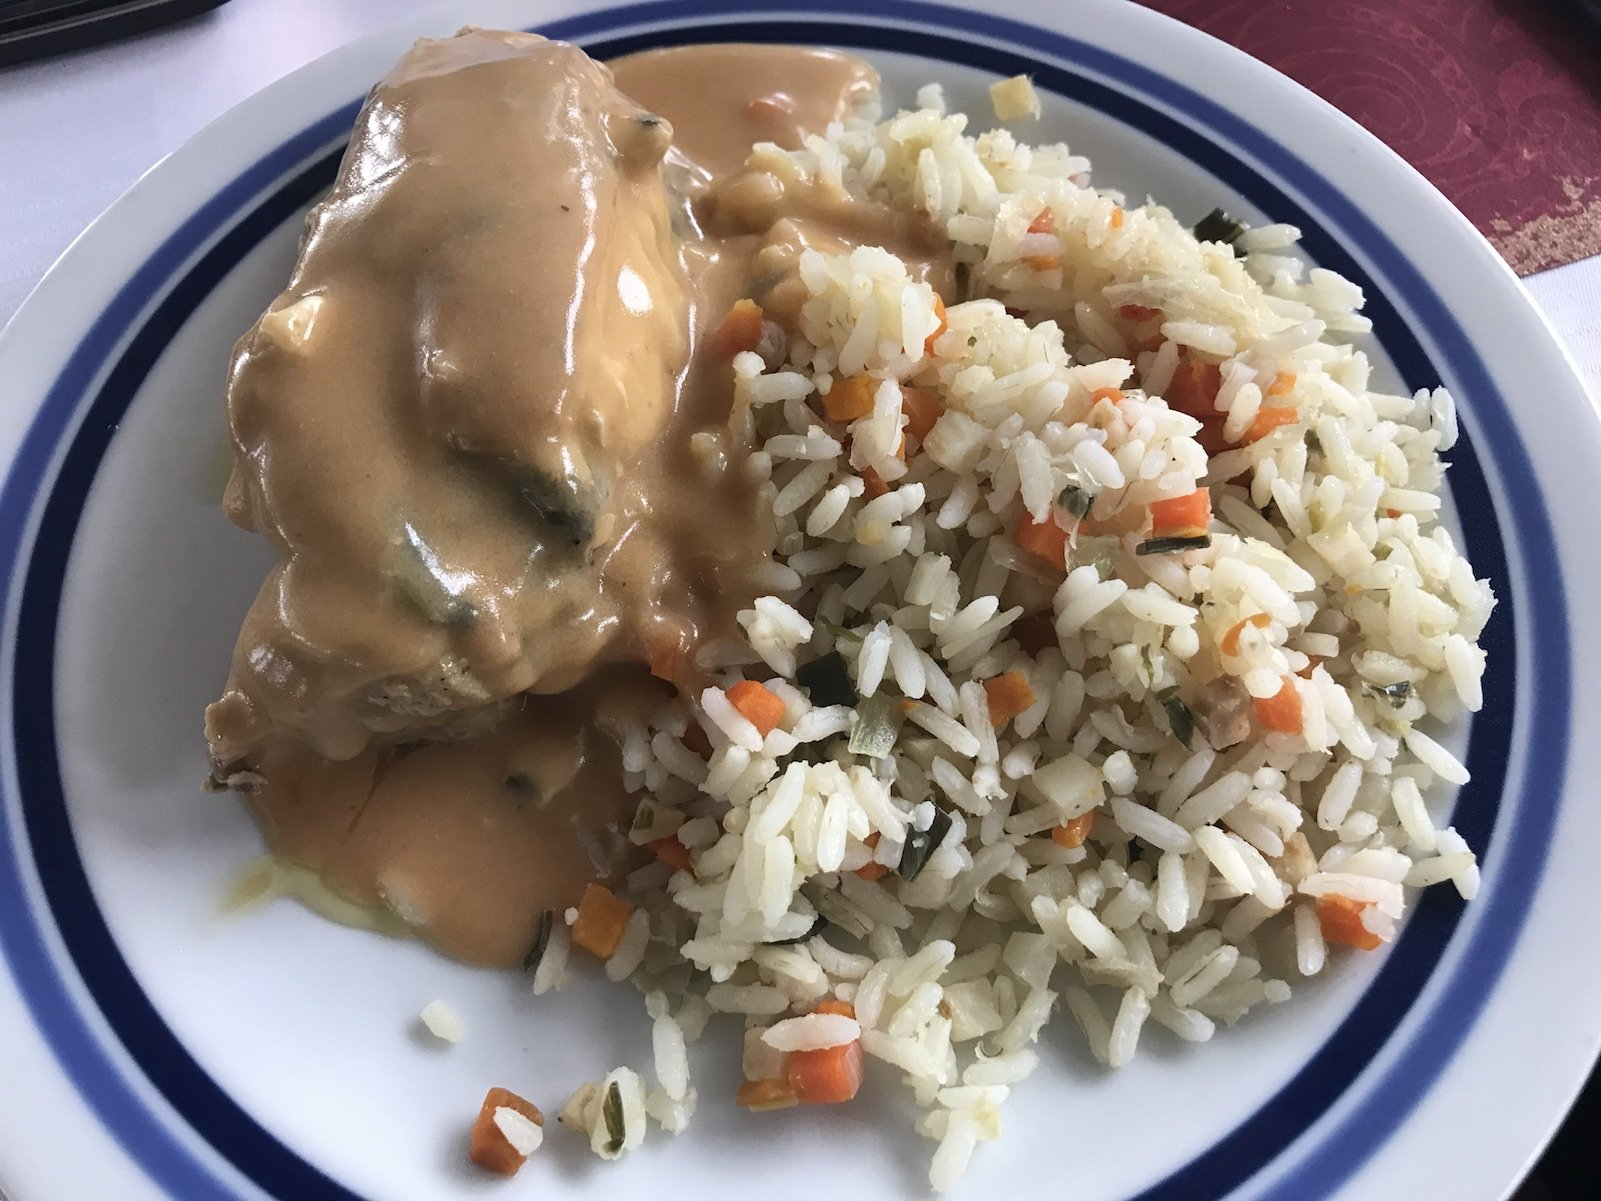 Hauptspeise: Huhn mit Reis